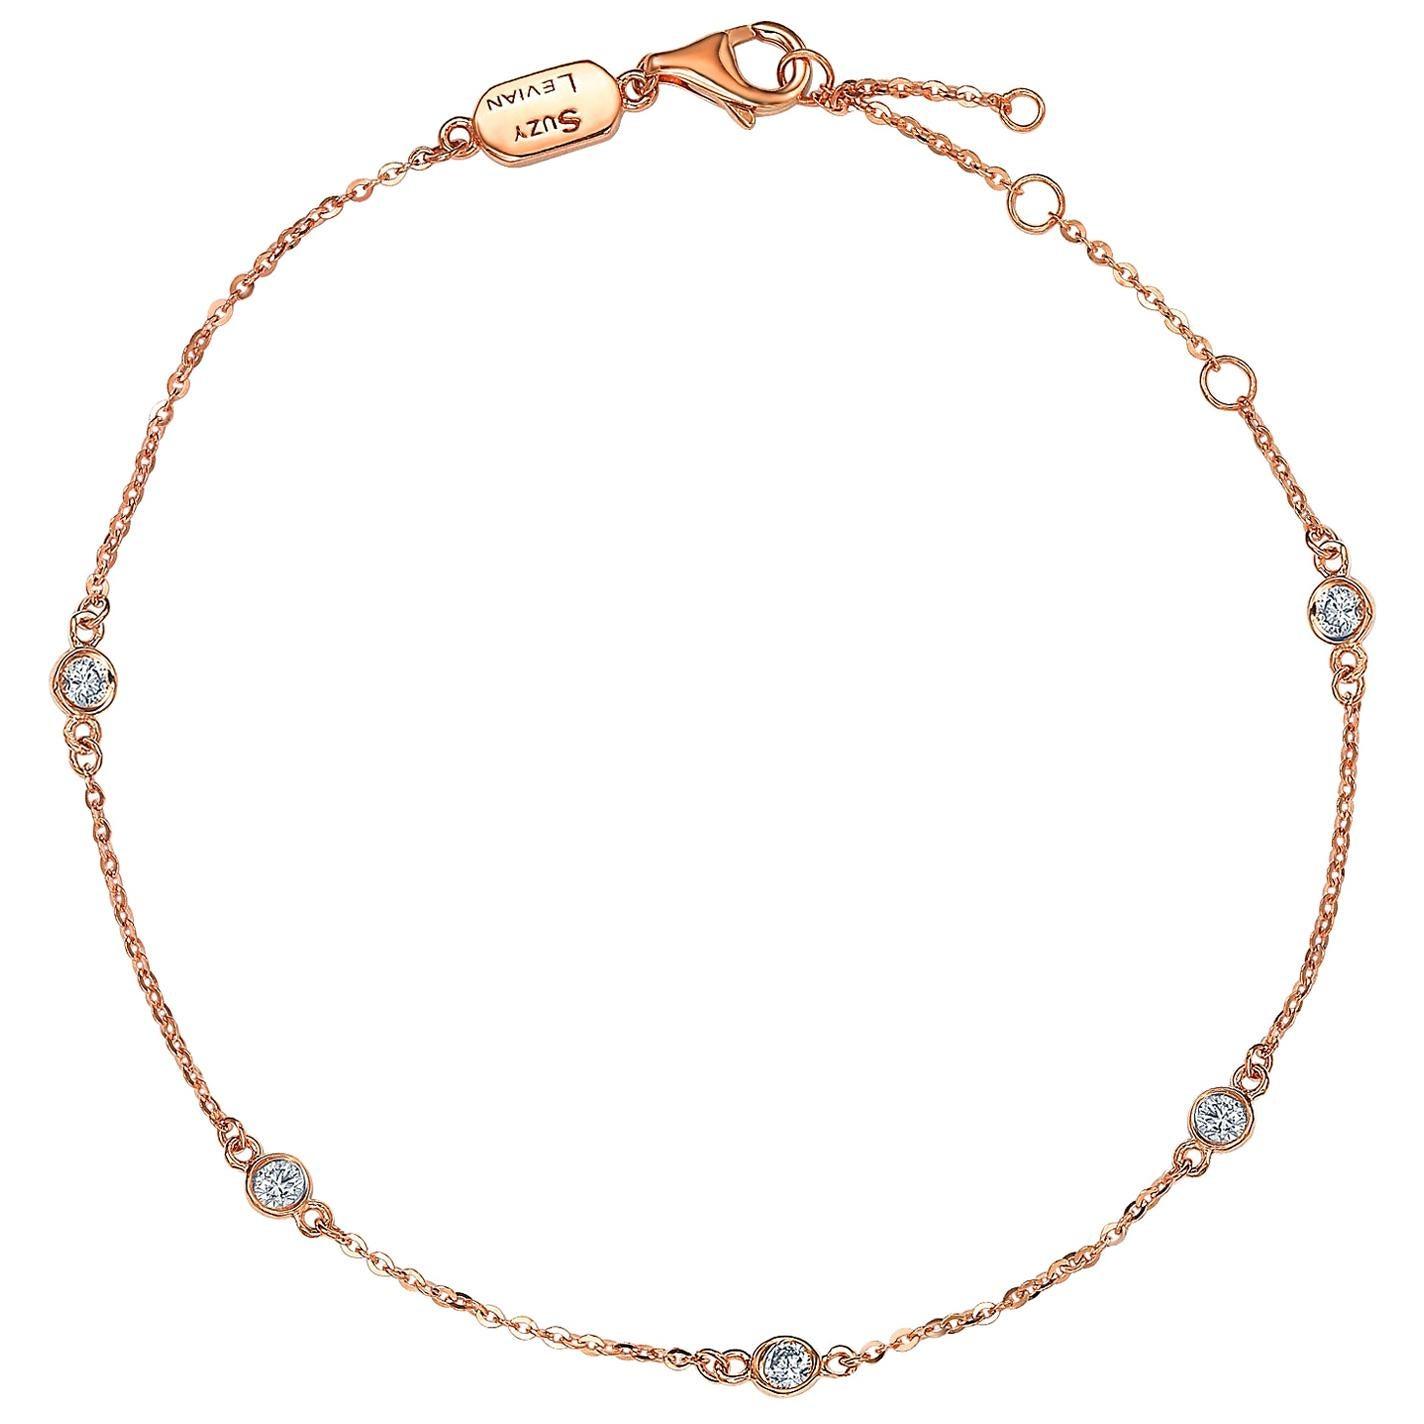 Suzy Levian 14 Karat Rose Gold 0.25 Carat Diamond Station Bracelet